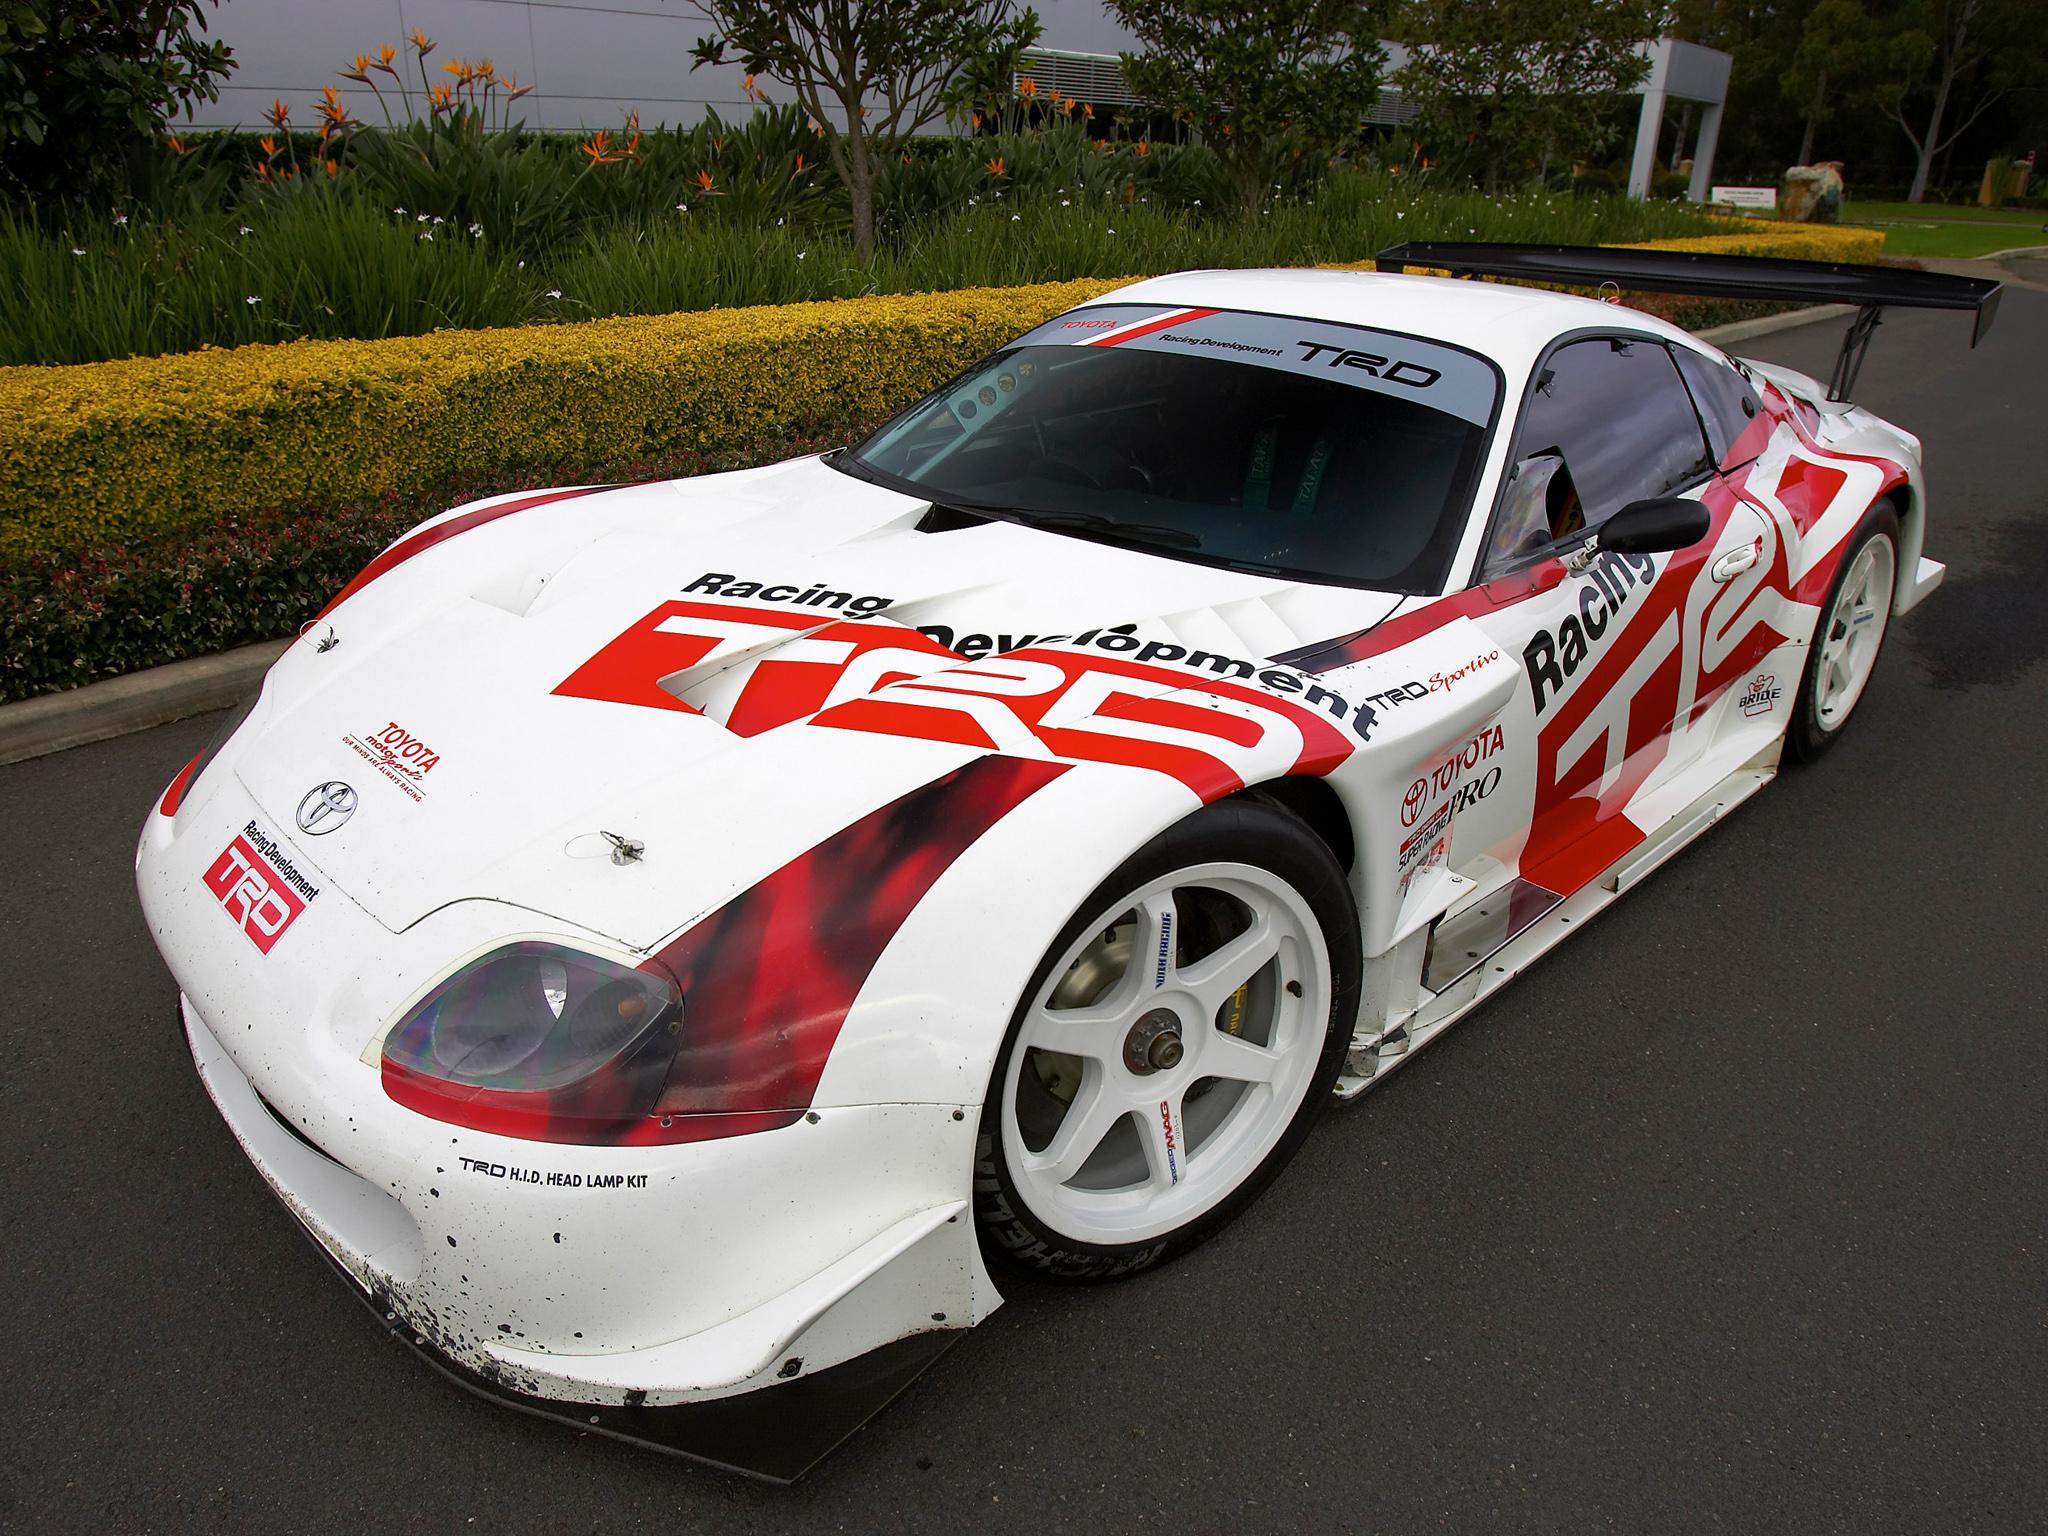 Toyota Supra GT500 JGTC '1995–2004 Full HD Wallpaper And